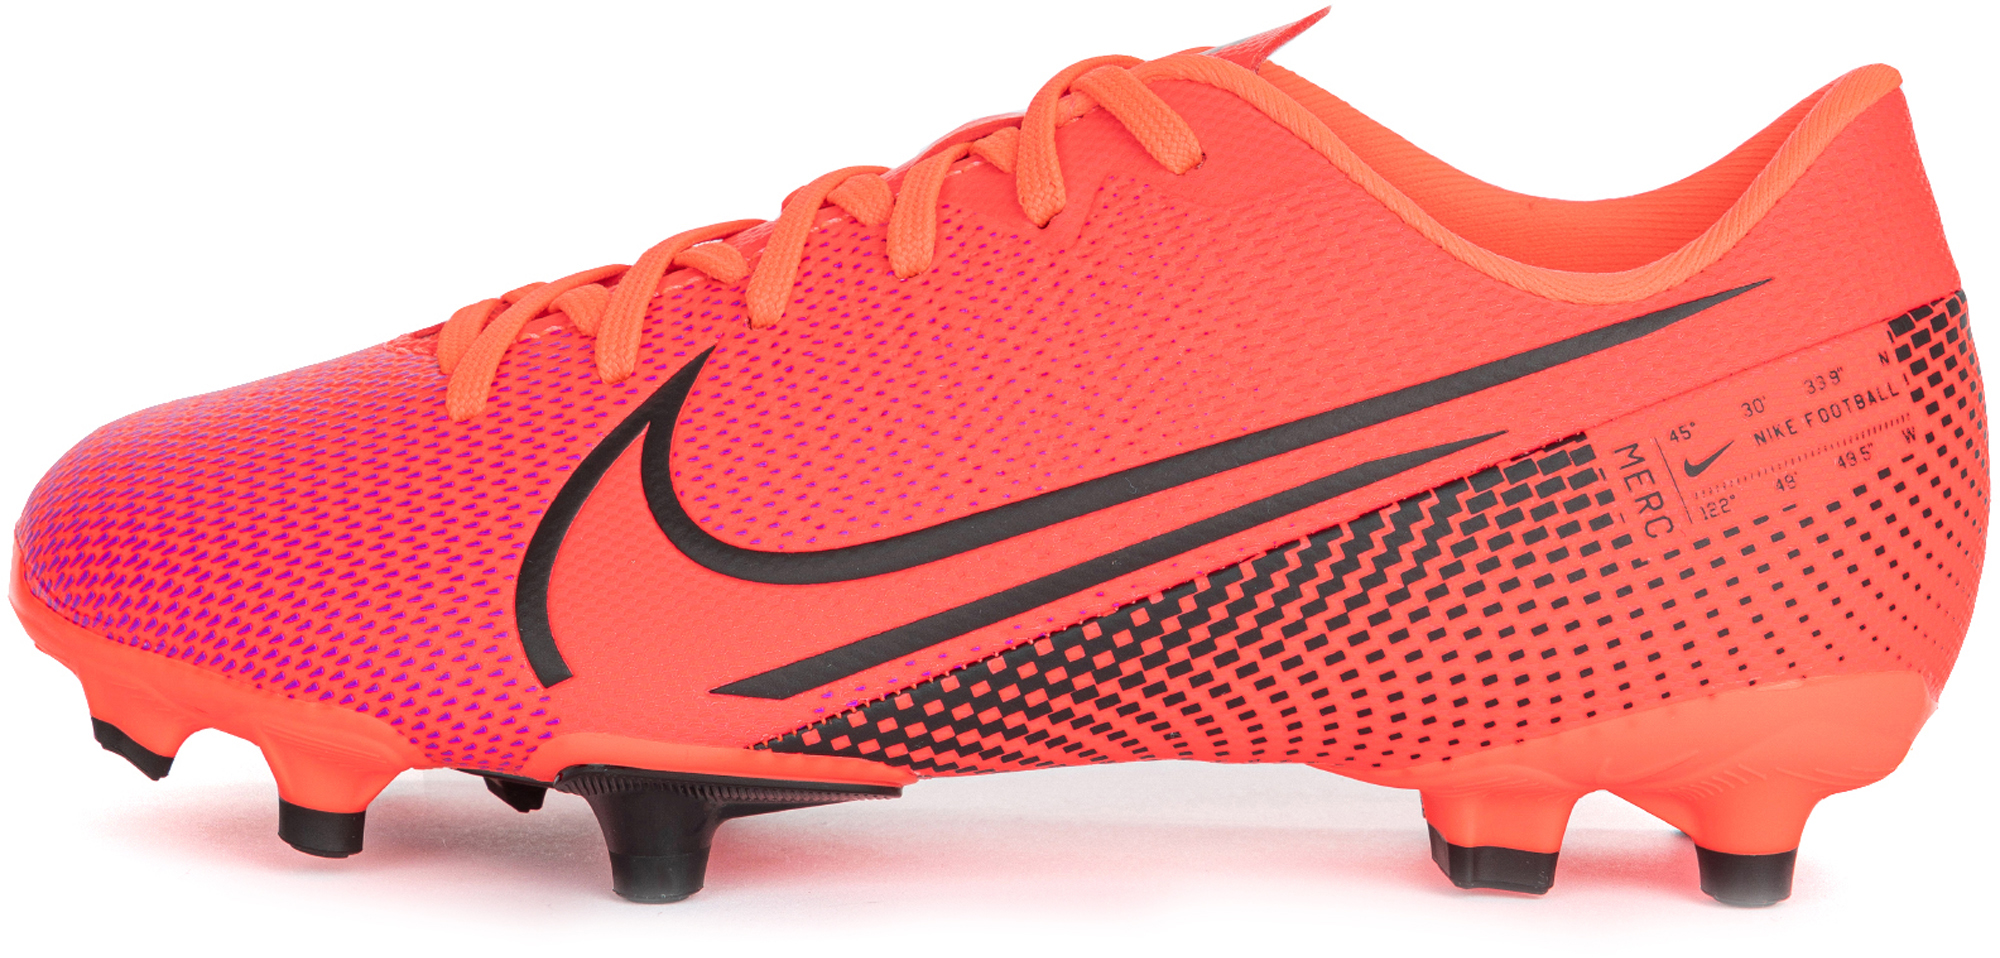 Nike Бутсы для мальчиков Nike Jr Vapor 13 Academy Fg/Mg, размер 36.5 бутсы детские nike vapor 13 club mg ps at8162 010